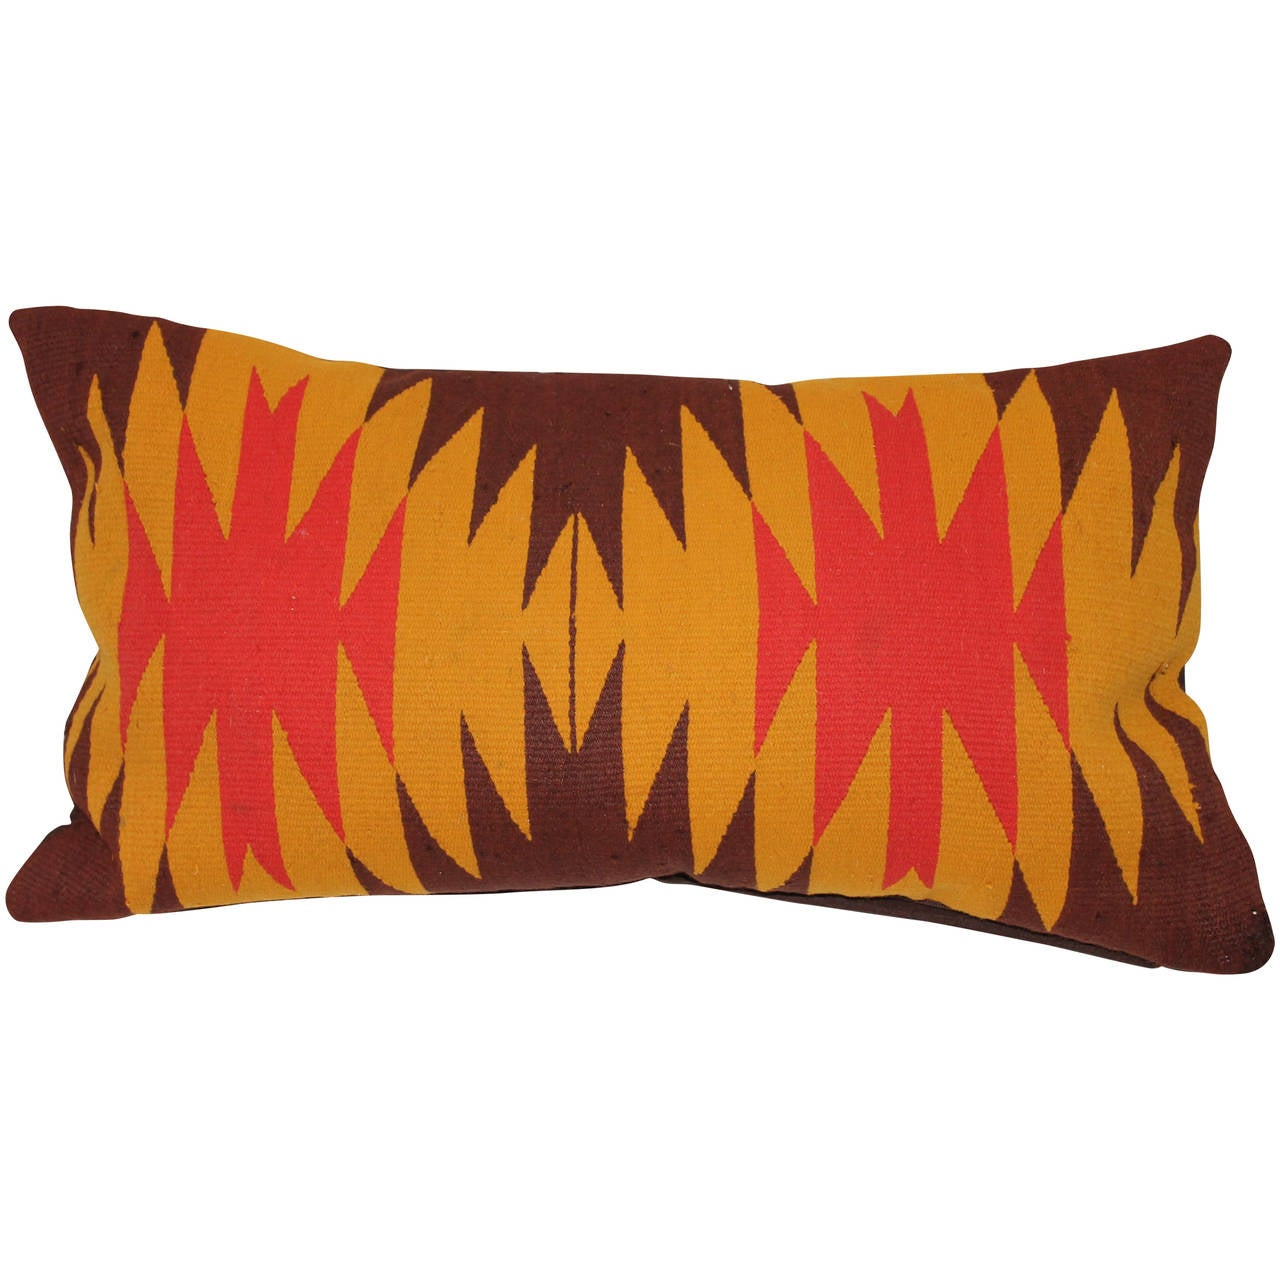 Navajo Indian Weaving Fibrant Bolster Pillow At 1stdibs